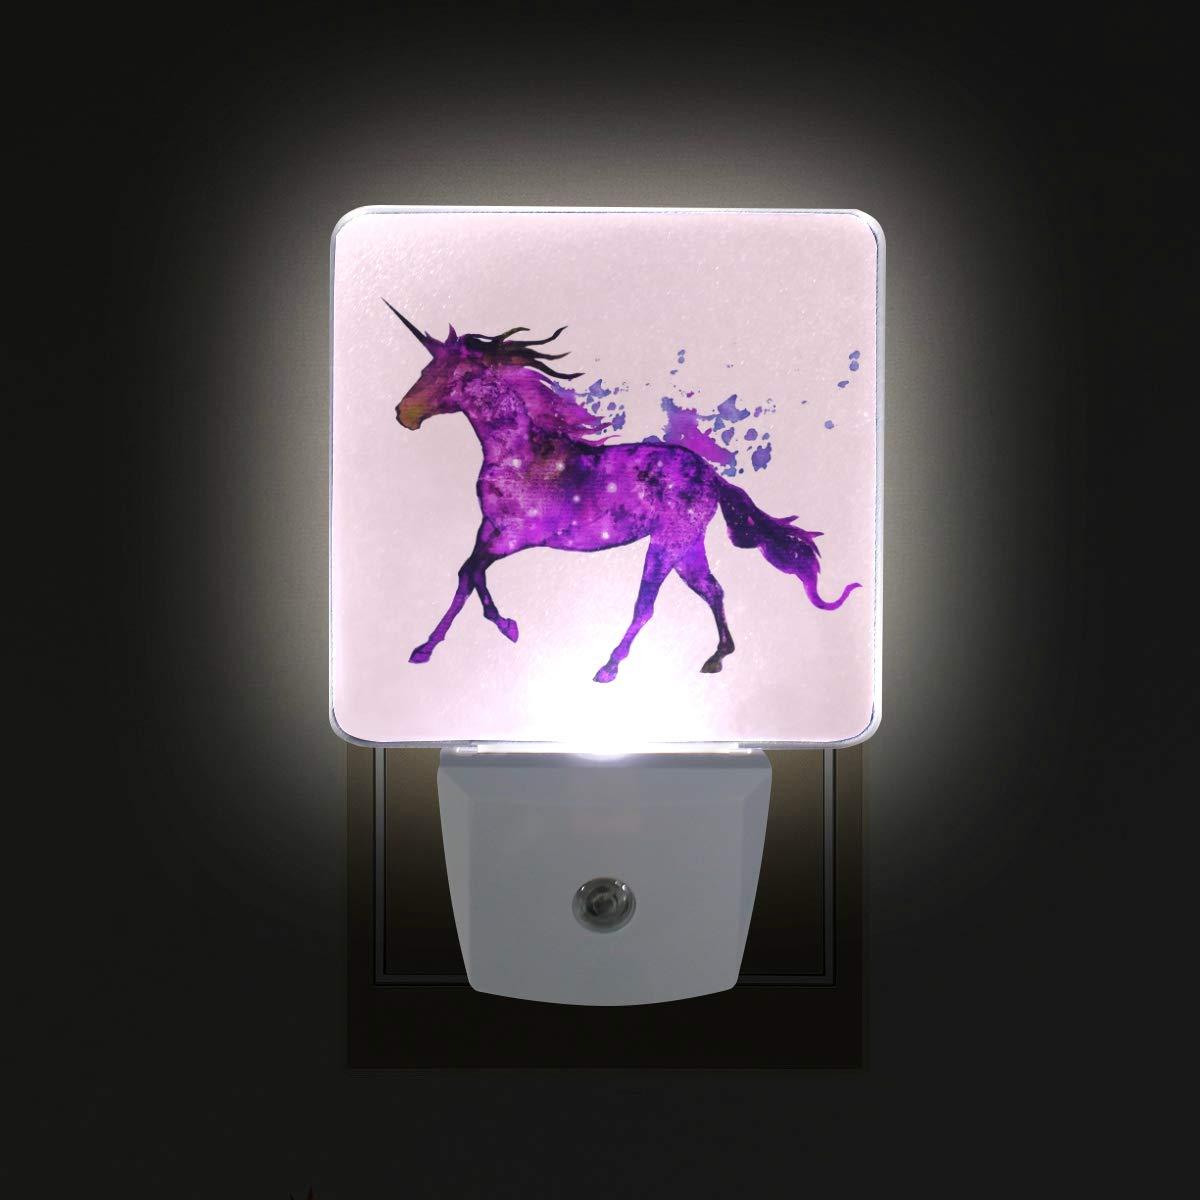 Brighter drawing purple unicorn led sensor night light for kidsadults bedroom dusk to dawn night lights lamp perfect for hallway dining room amazon